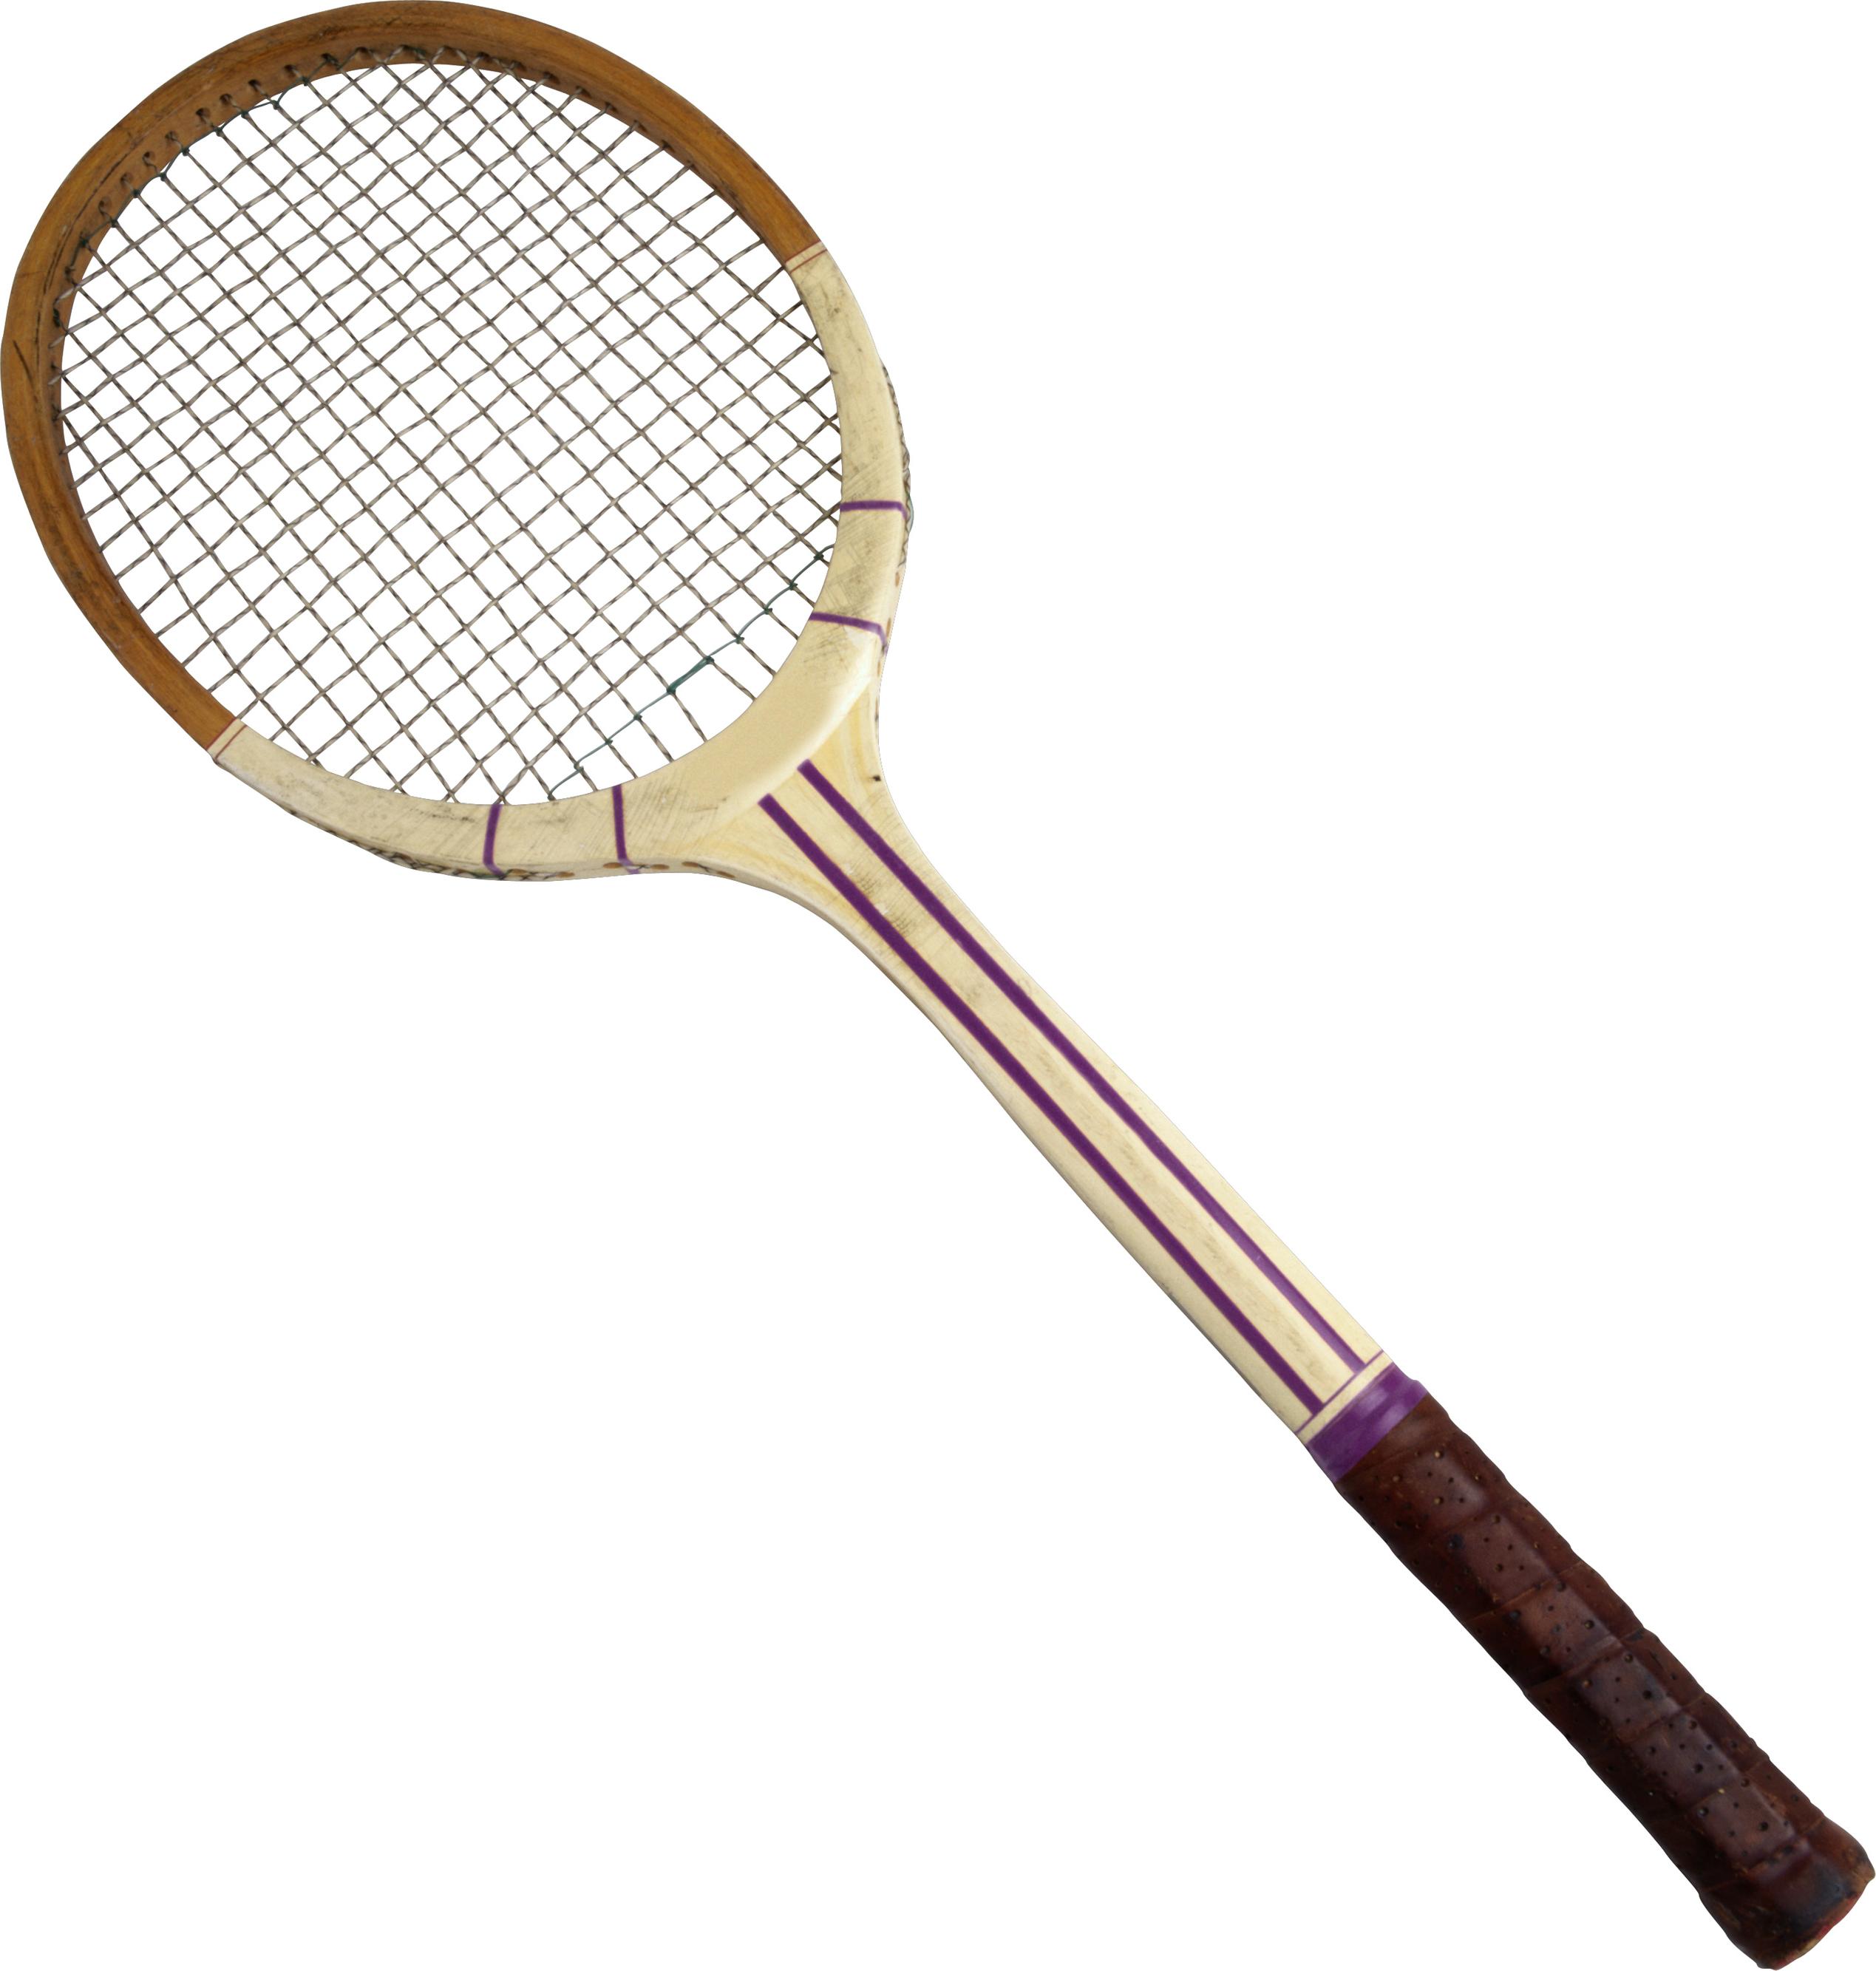 Badminton Racket Png Image Badminton Racket Rackets Badminton